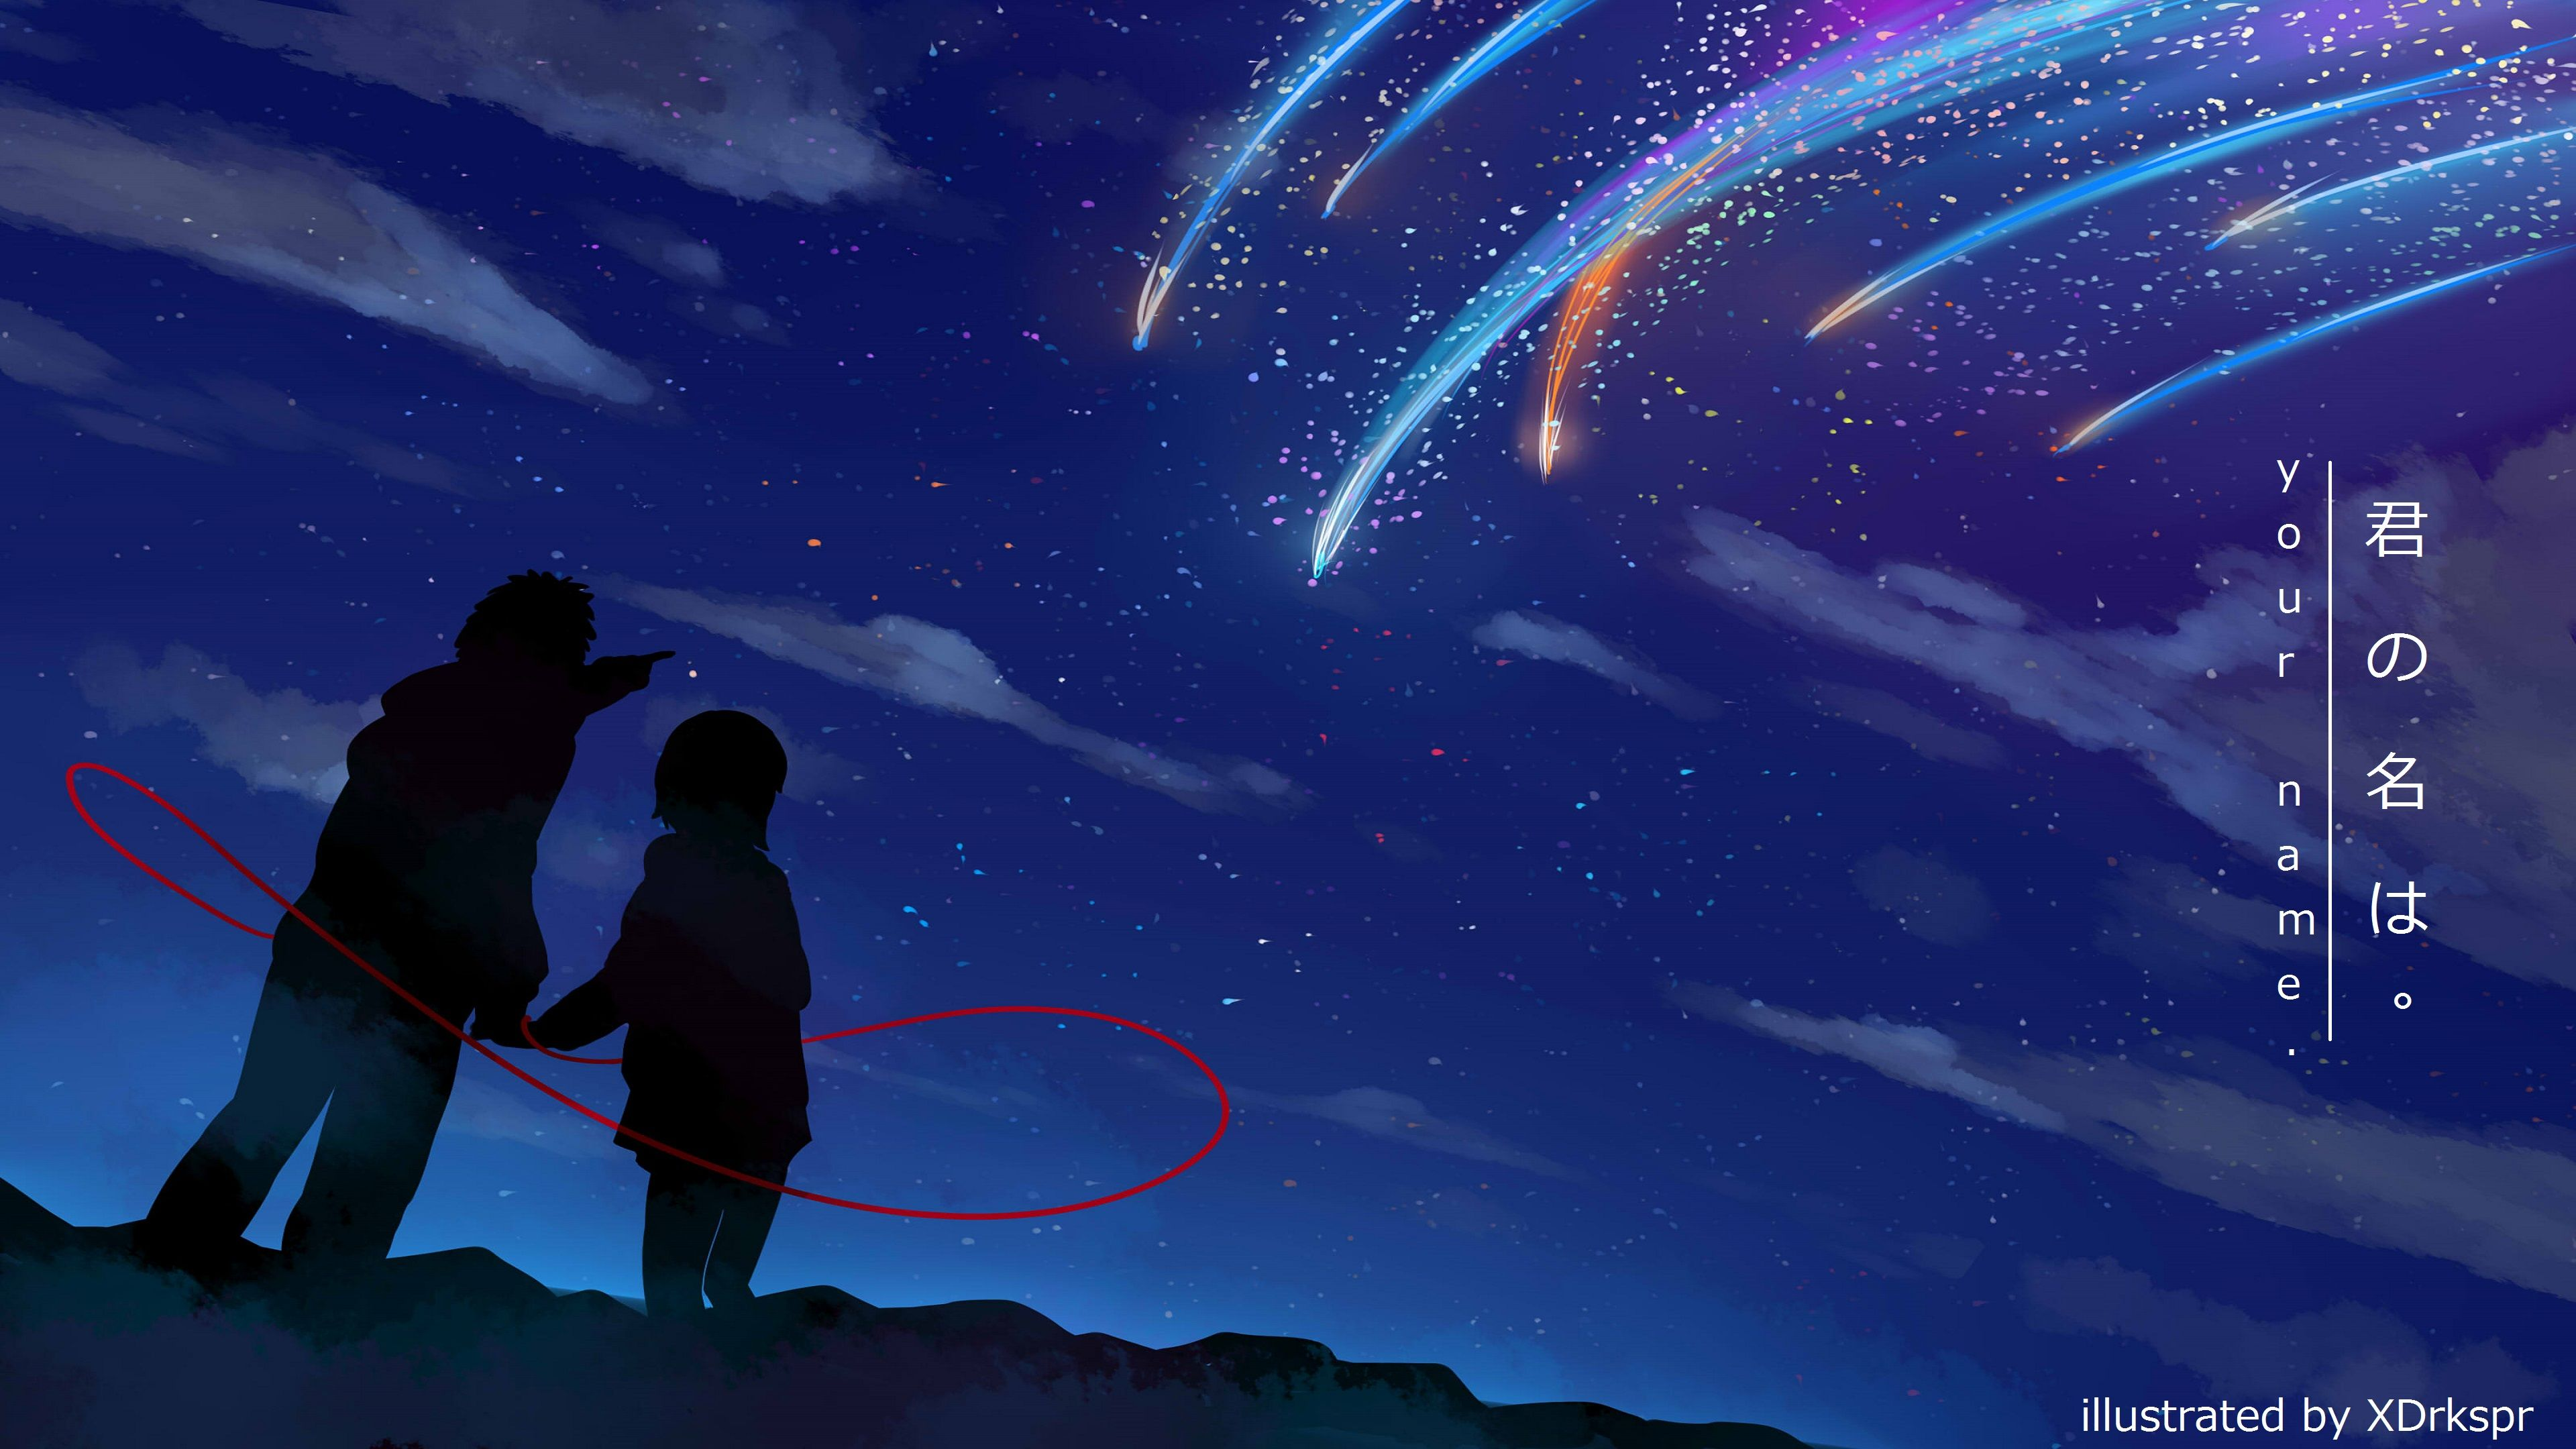 Kimi no na wa your name live wallpaper 4k duration. Pin on Anime & Manga